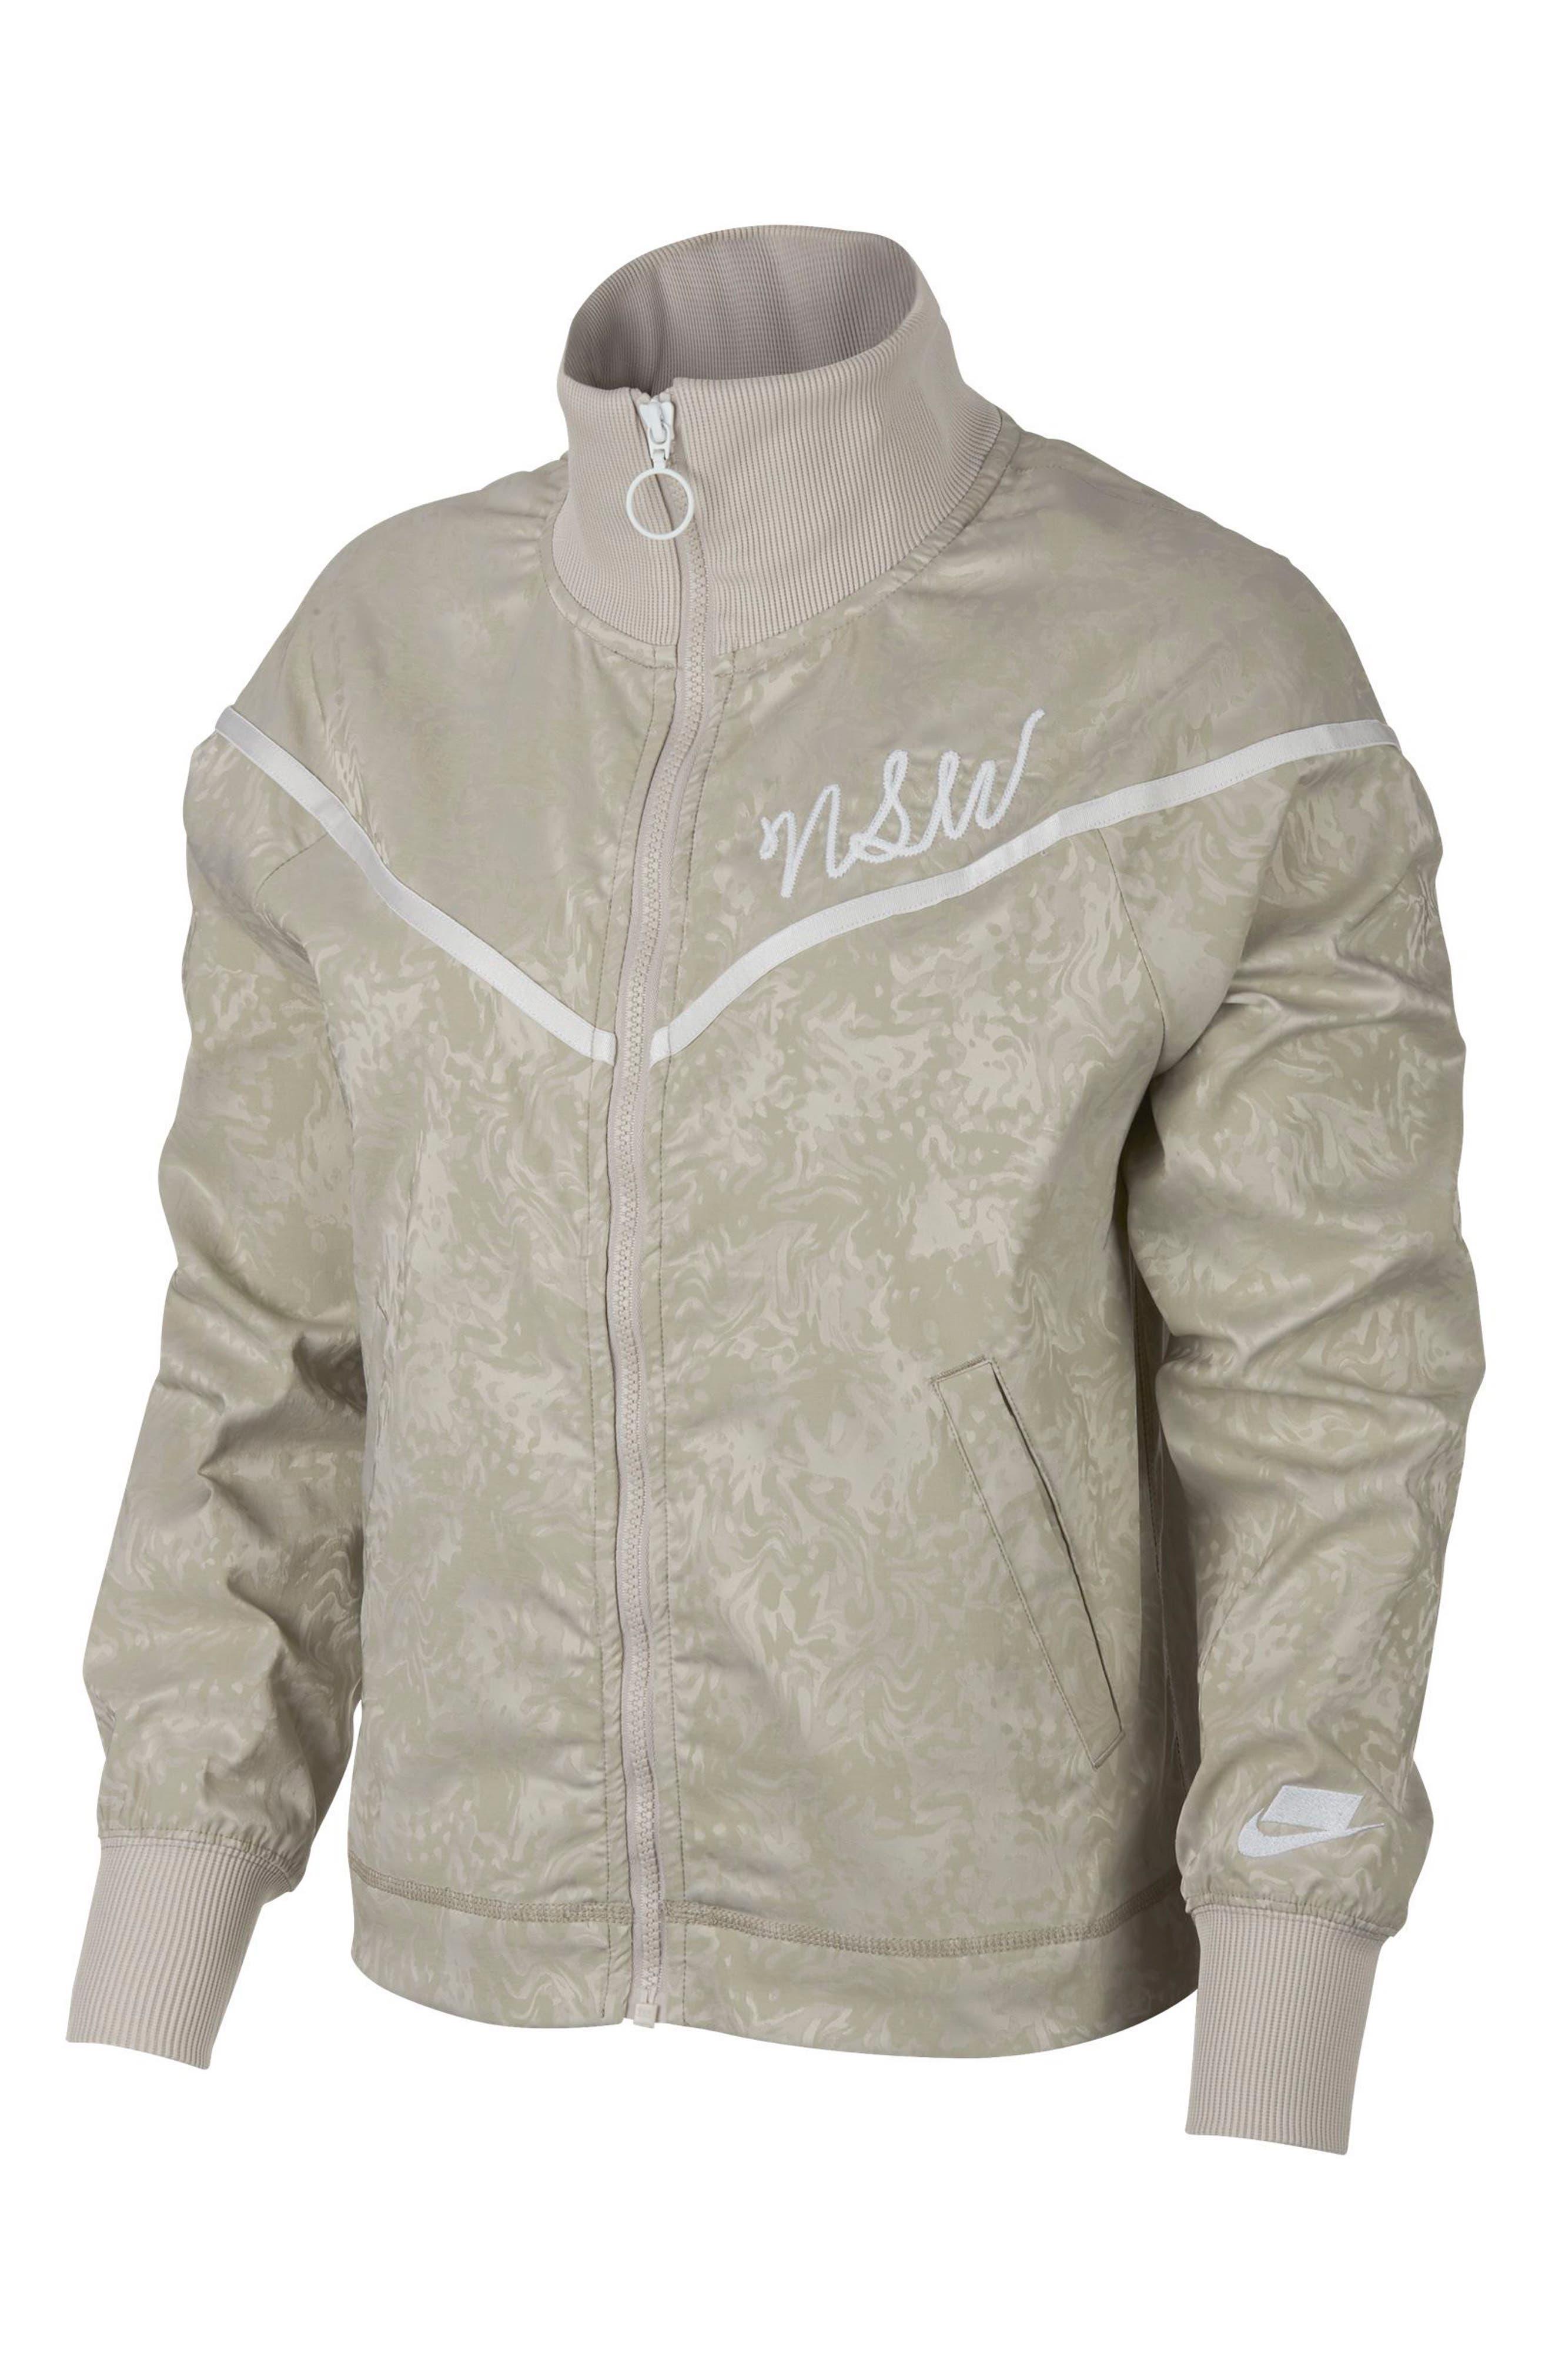 Sportswear NSW Women's Track Jacket,                         Main,                         color, STRING/ PHANTOM/ STRING/ WHITE